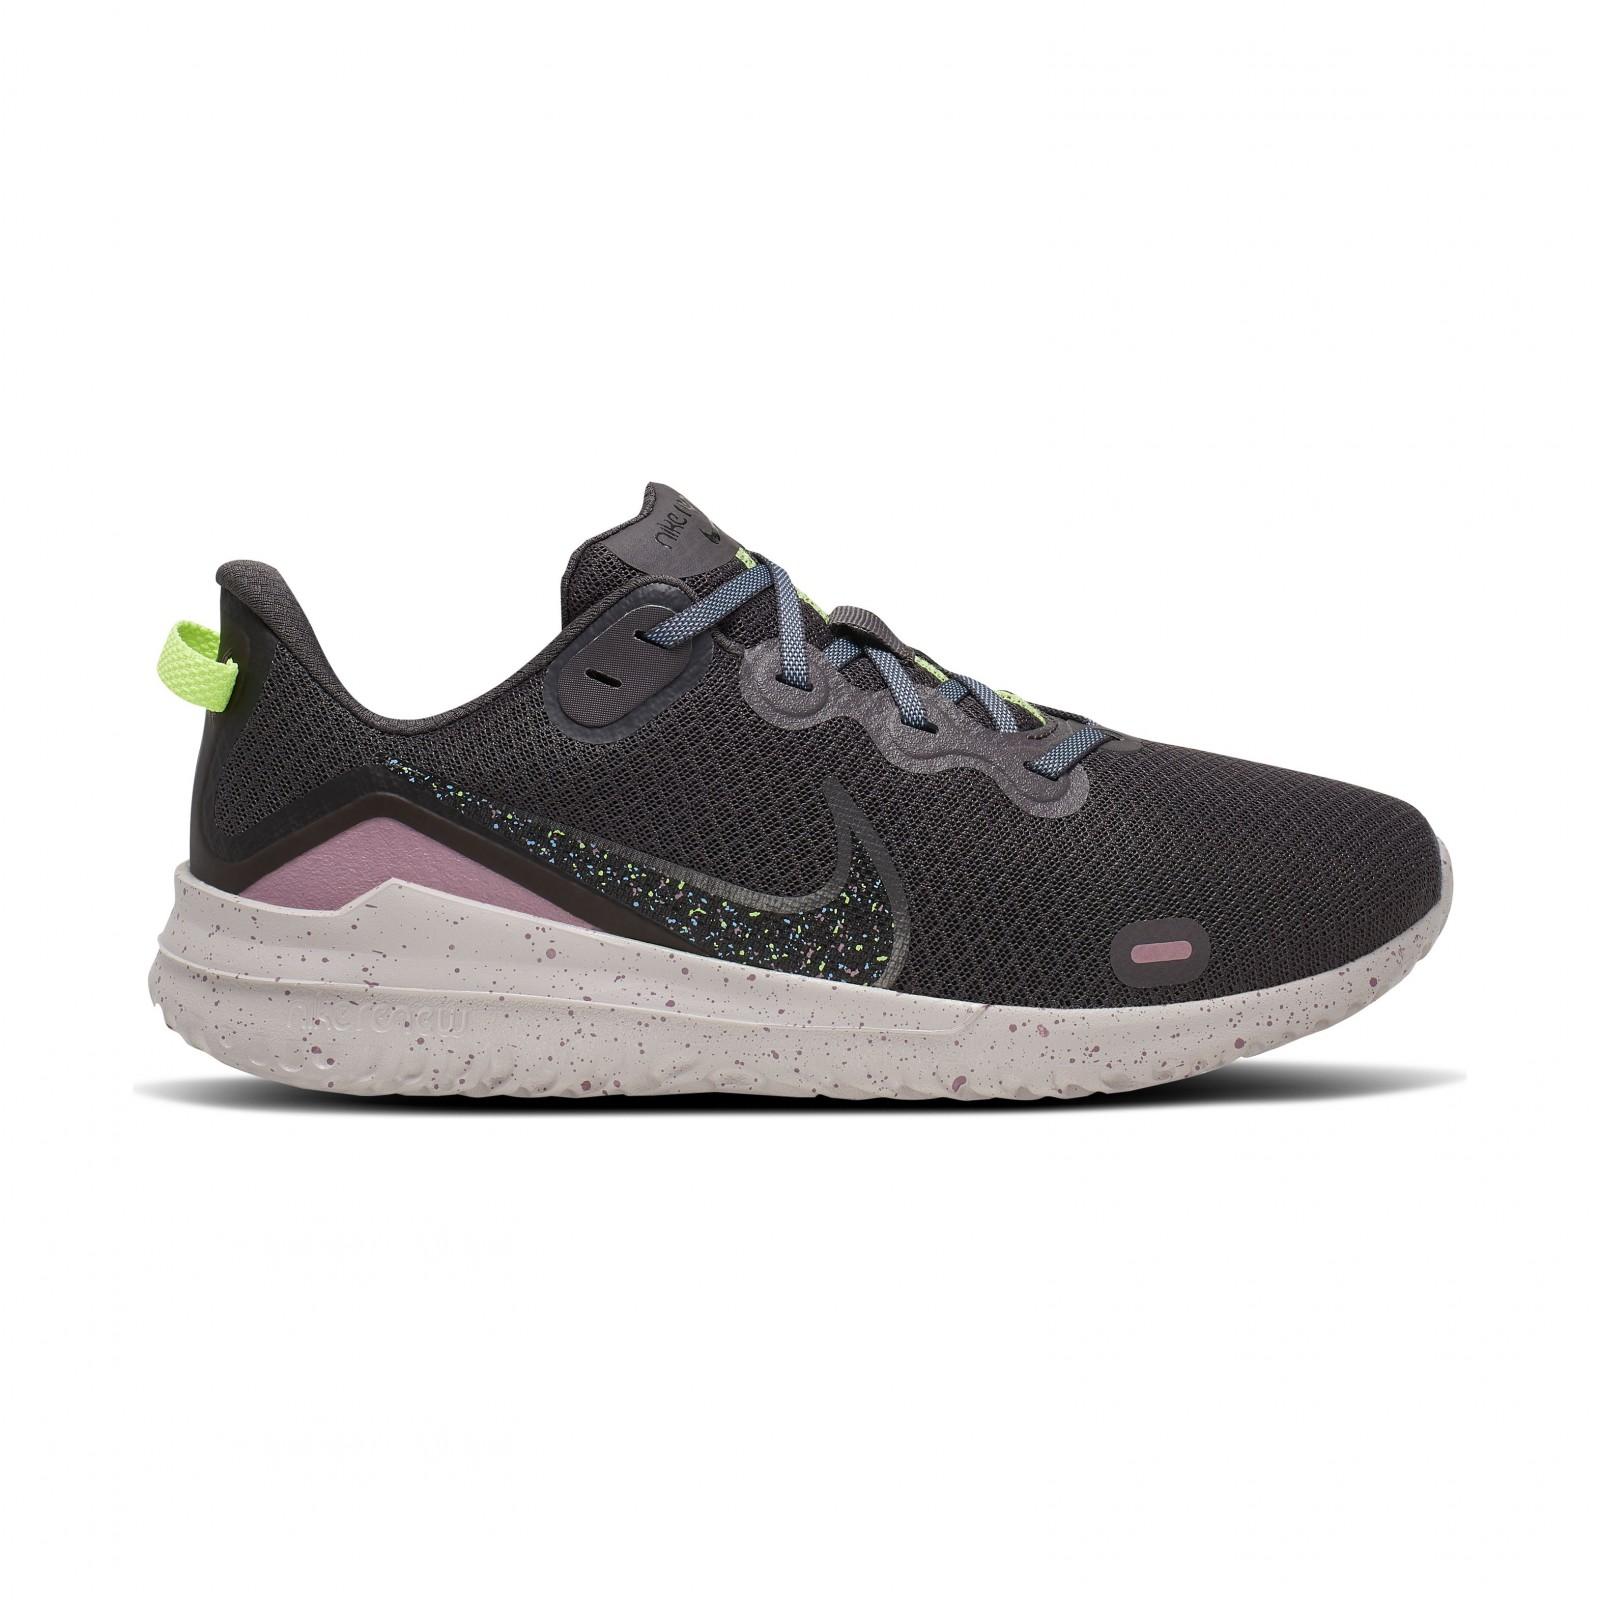 Nike Renew Ride Special Edition THUNDER GREY/BLACK-PLUM DUST